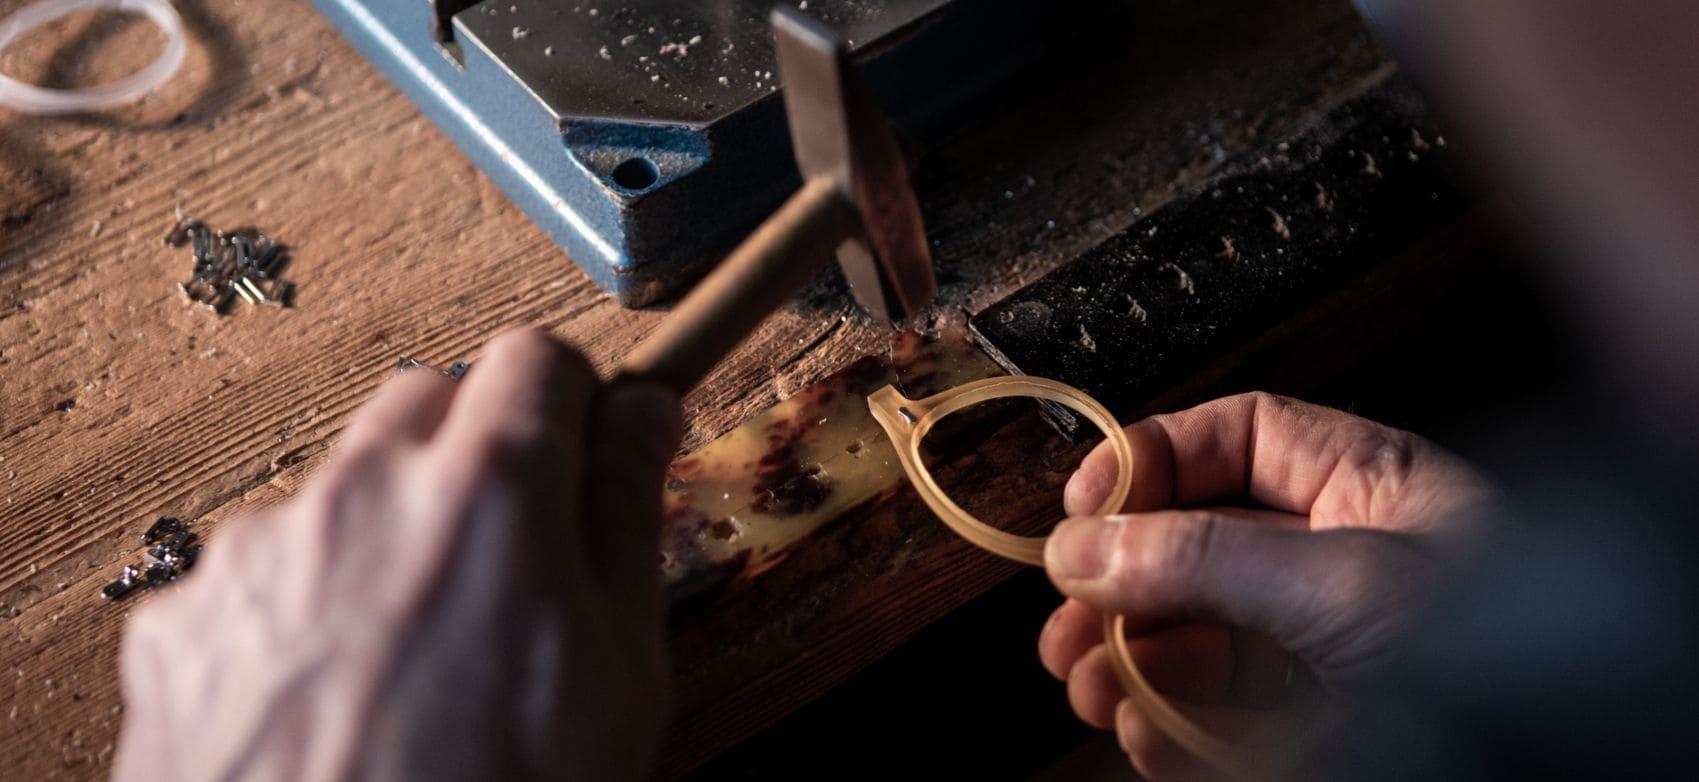 The Bespoke Dudes Eyewear, l'eccellenza made in Italy